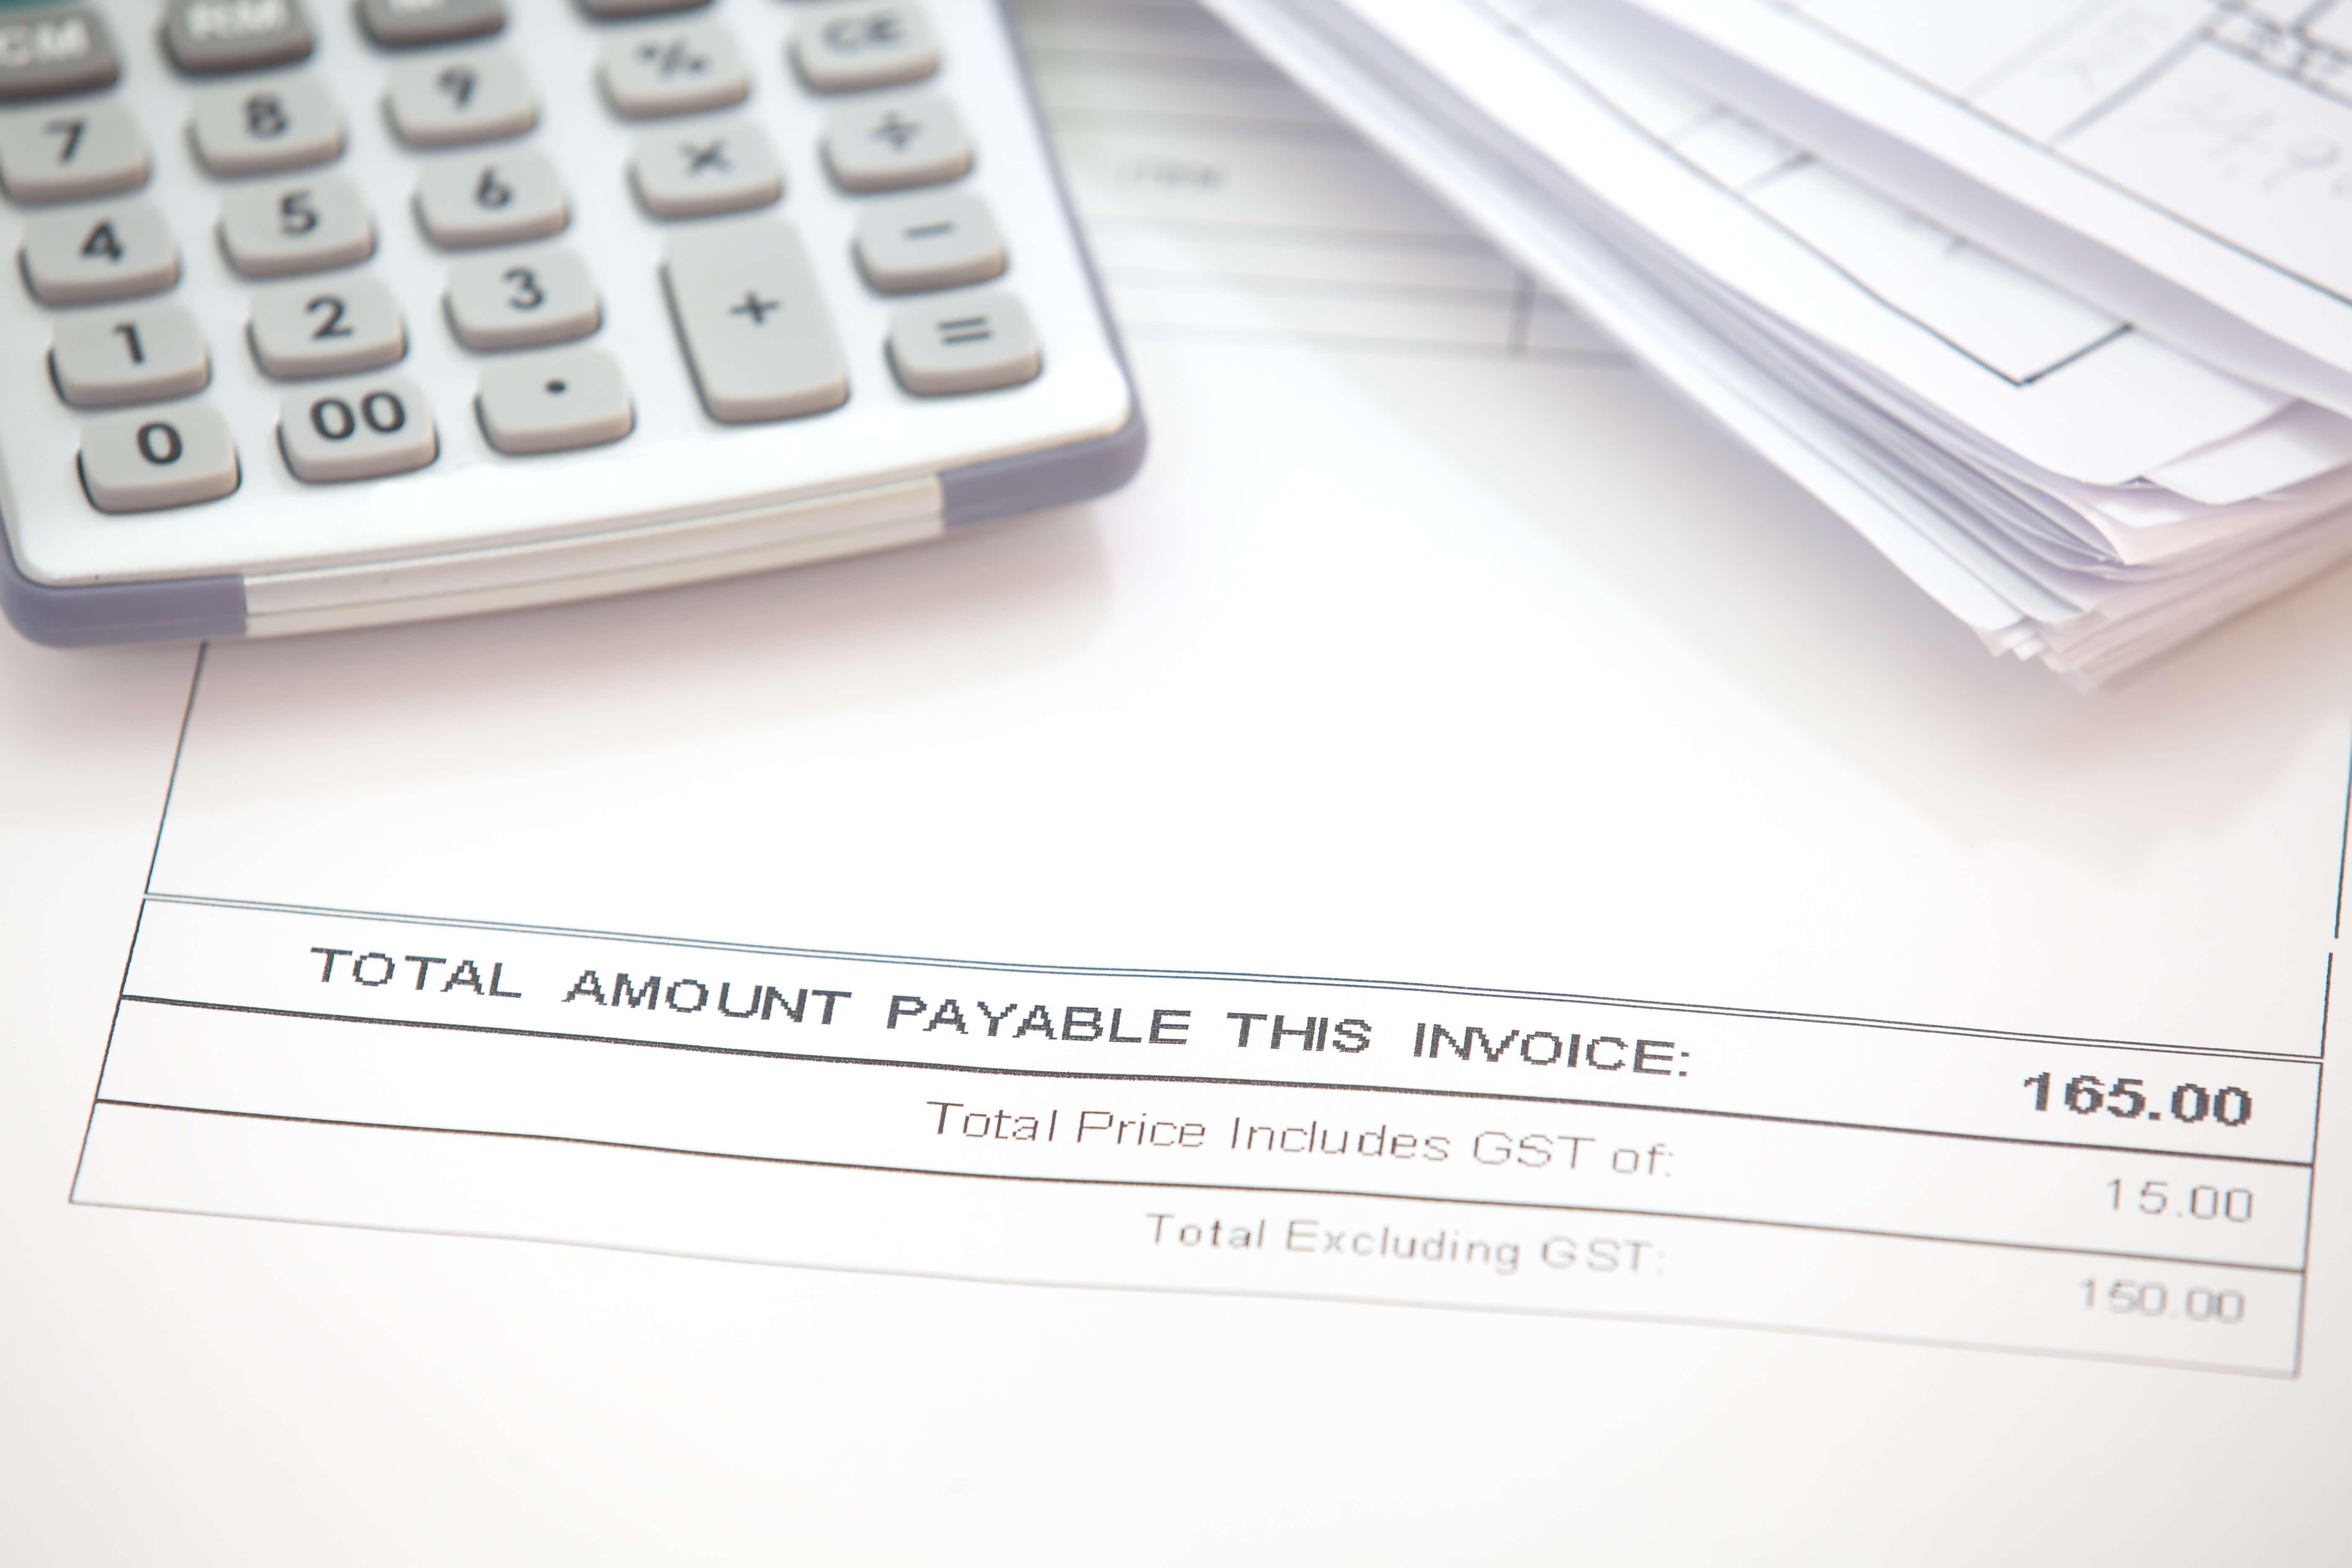 Invoicing basics